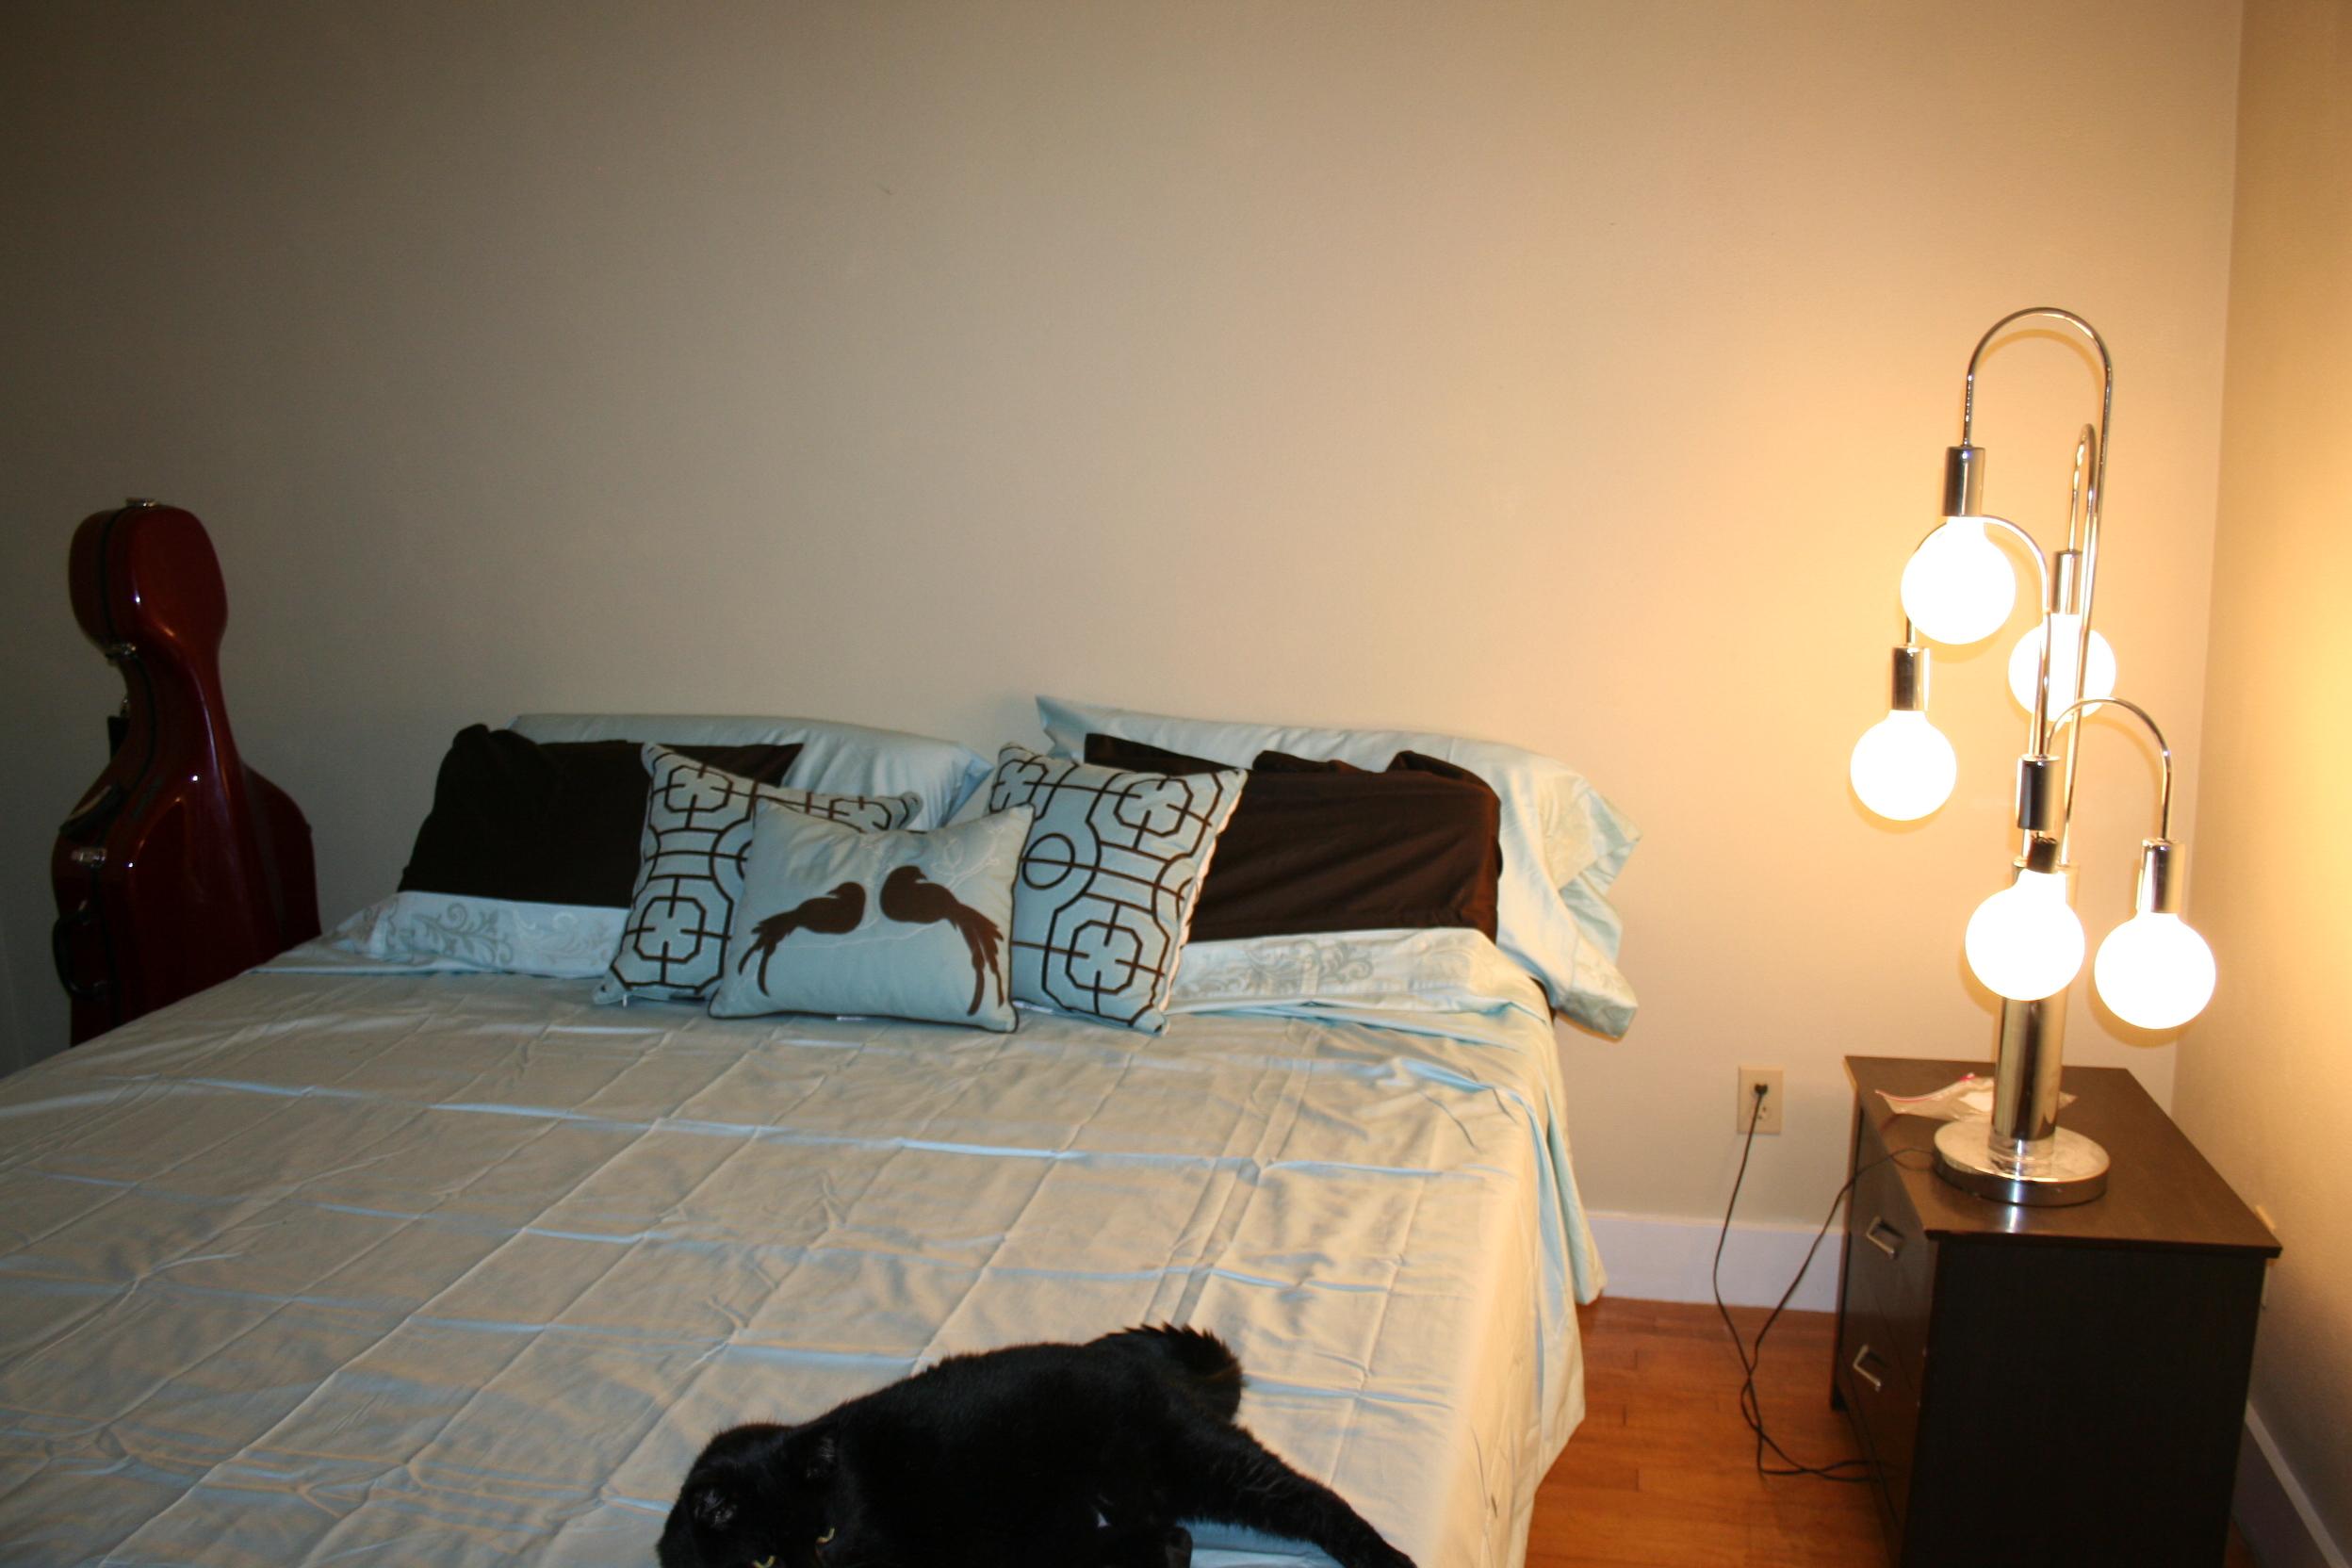 Tempurpedic King Size Bed Sheets